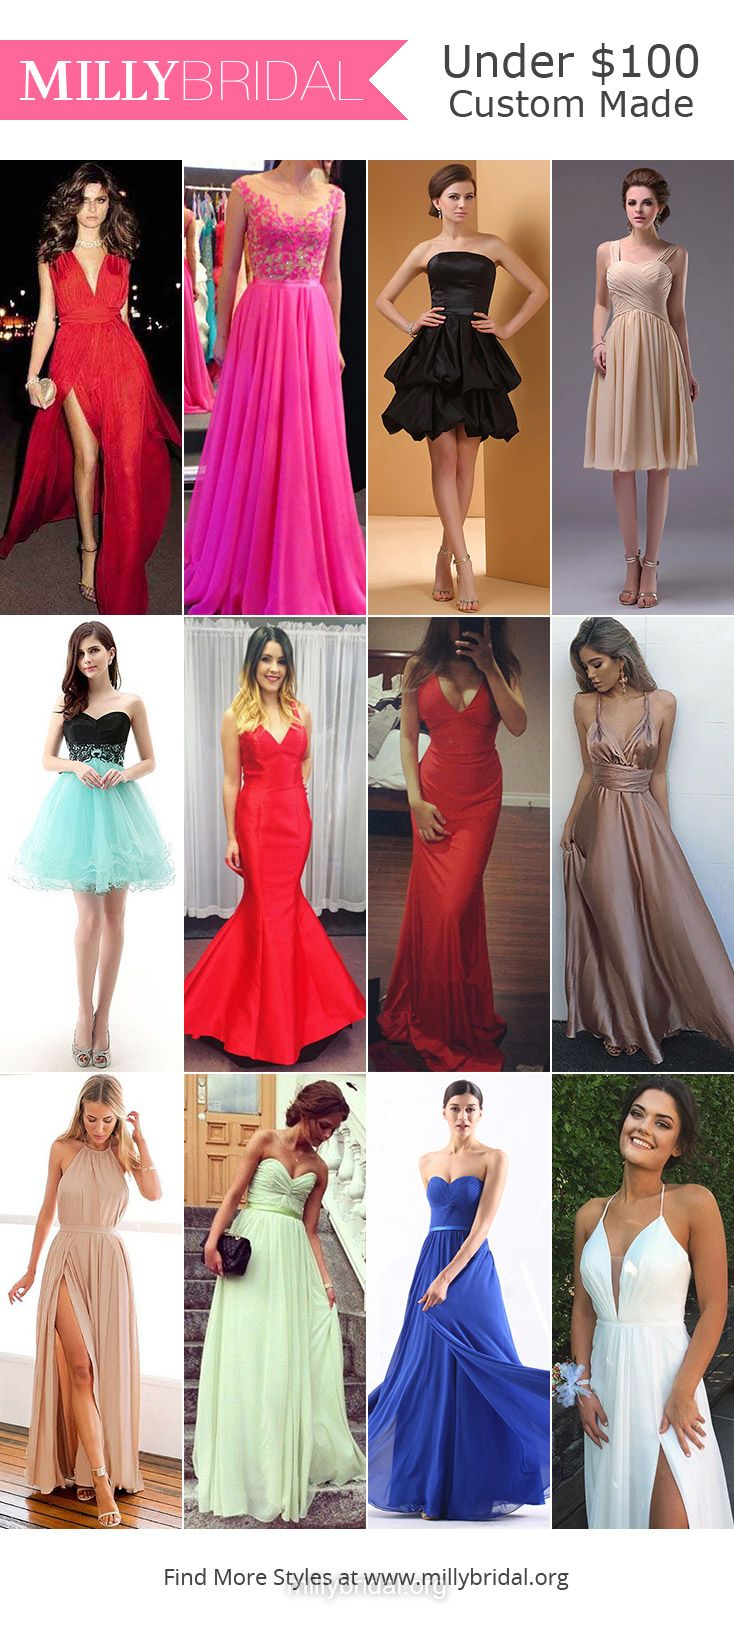 Cheap Prom Dresses Under 100, Prom Dresses Under 100 Long, Prom ...